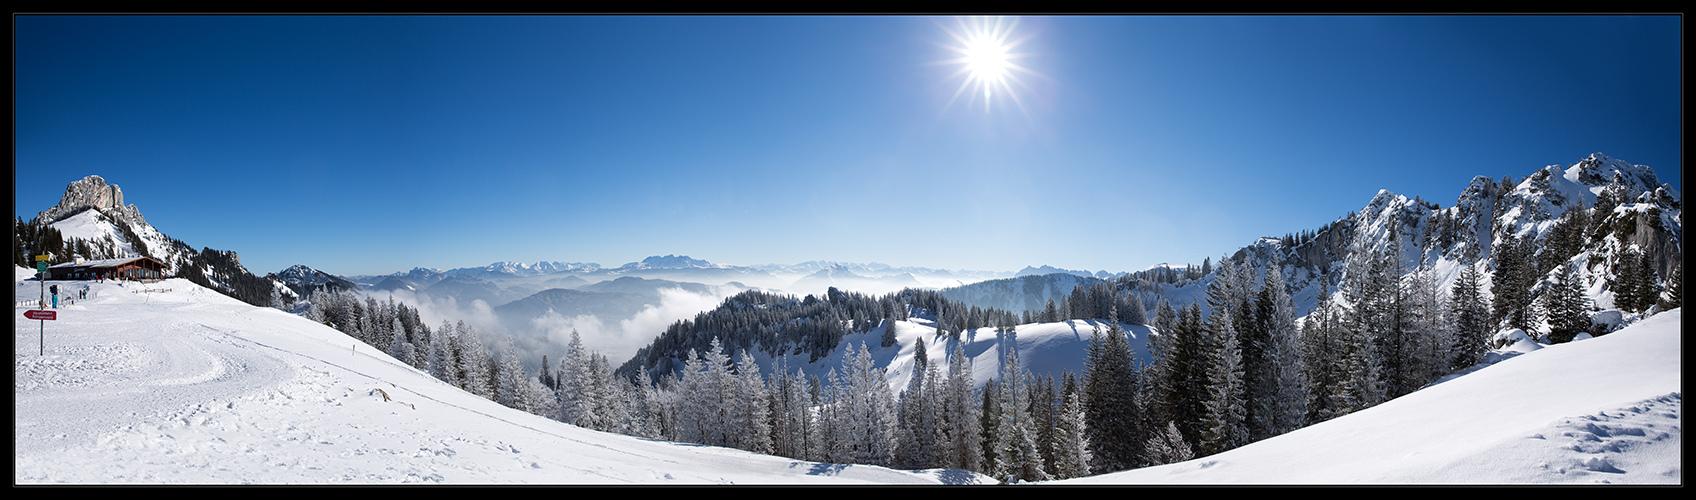 Kampenwand-Panorama